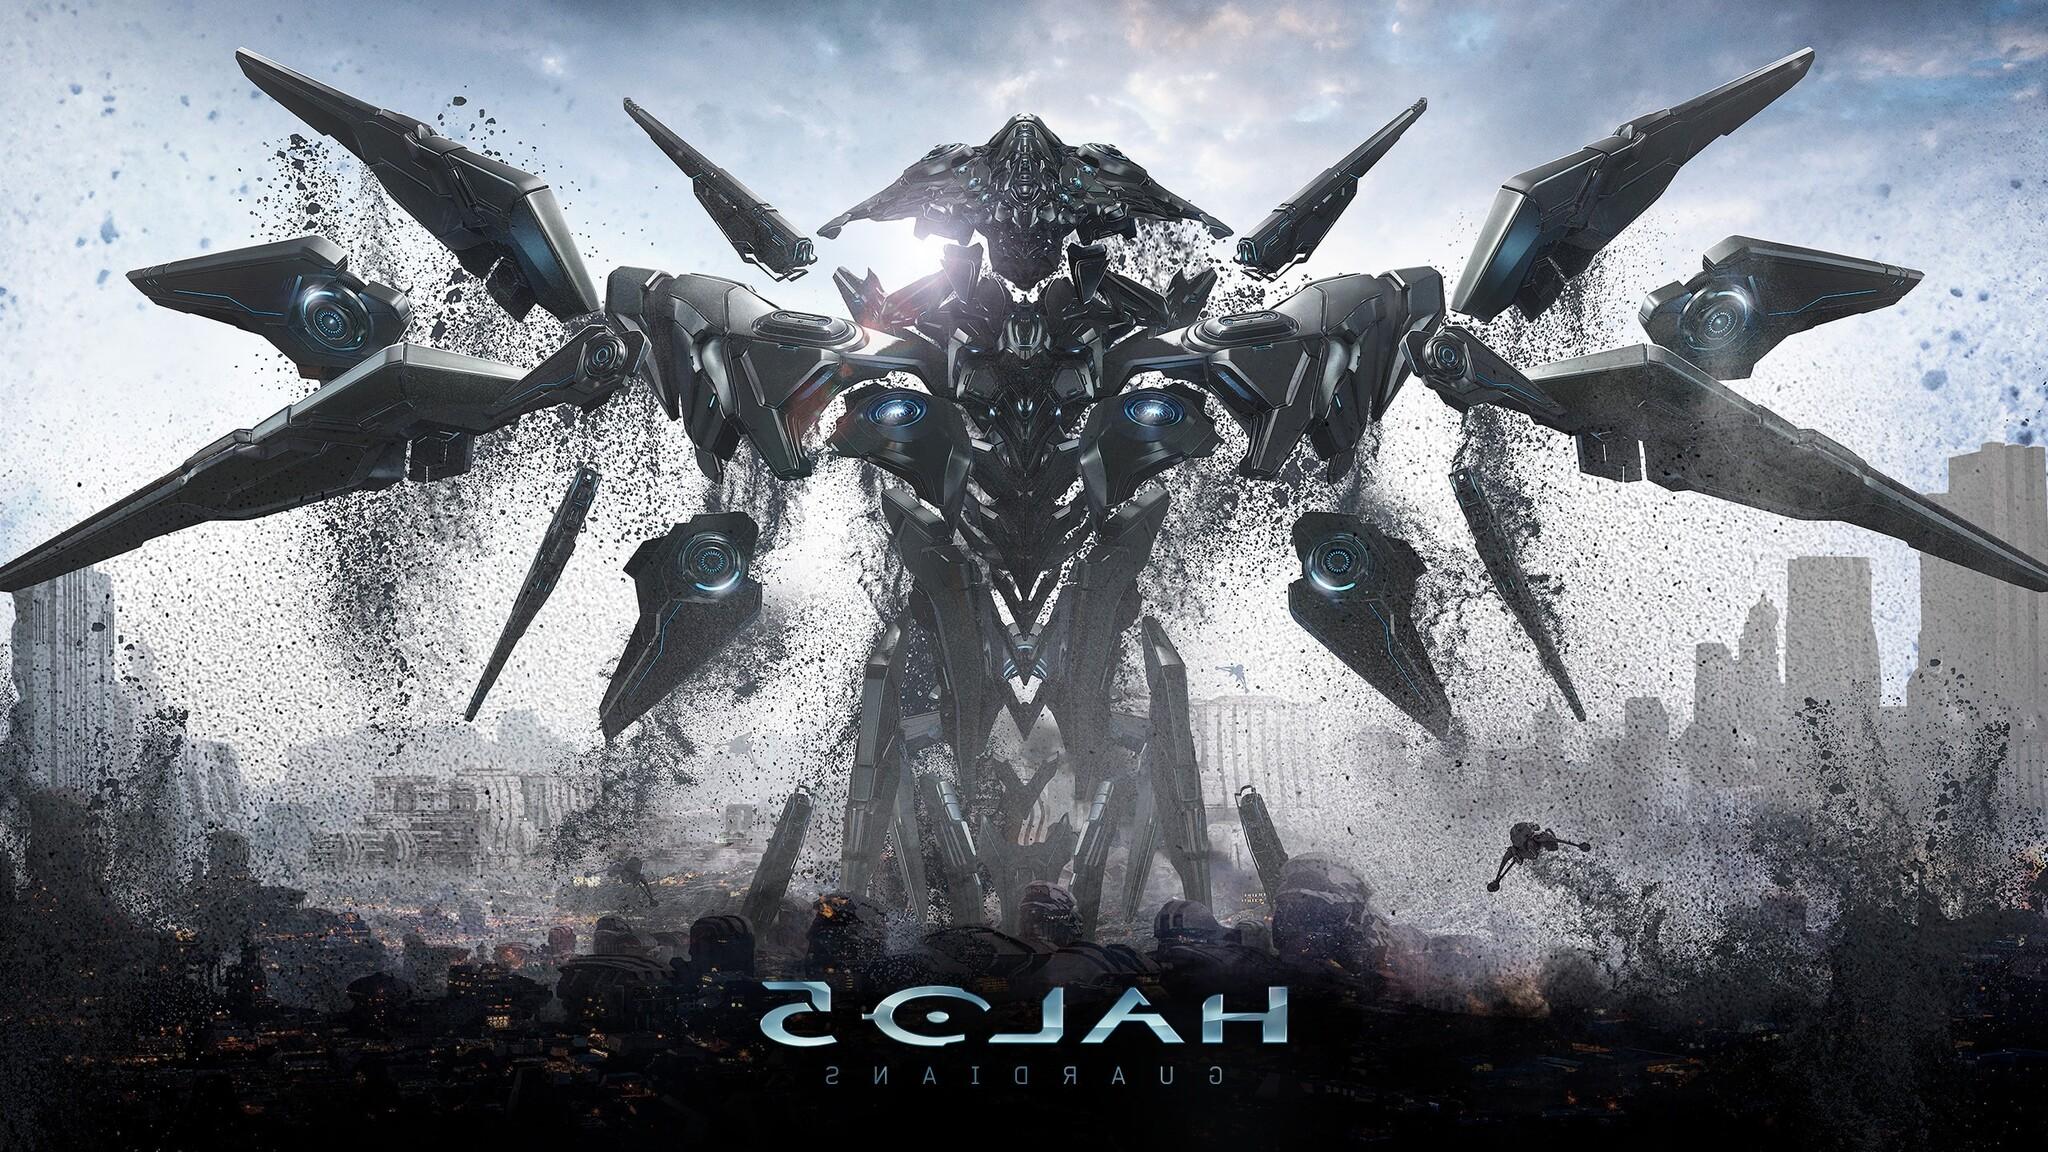 2048x1152 Halo 5 Guardians 2048x1152 Resolution HD 4k